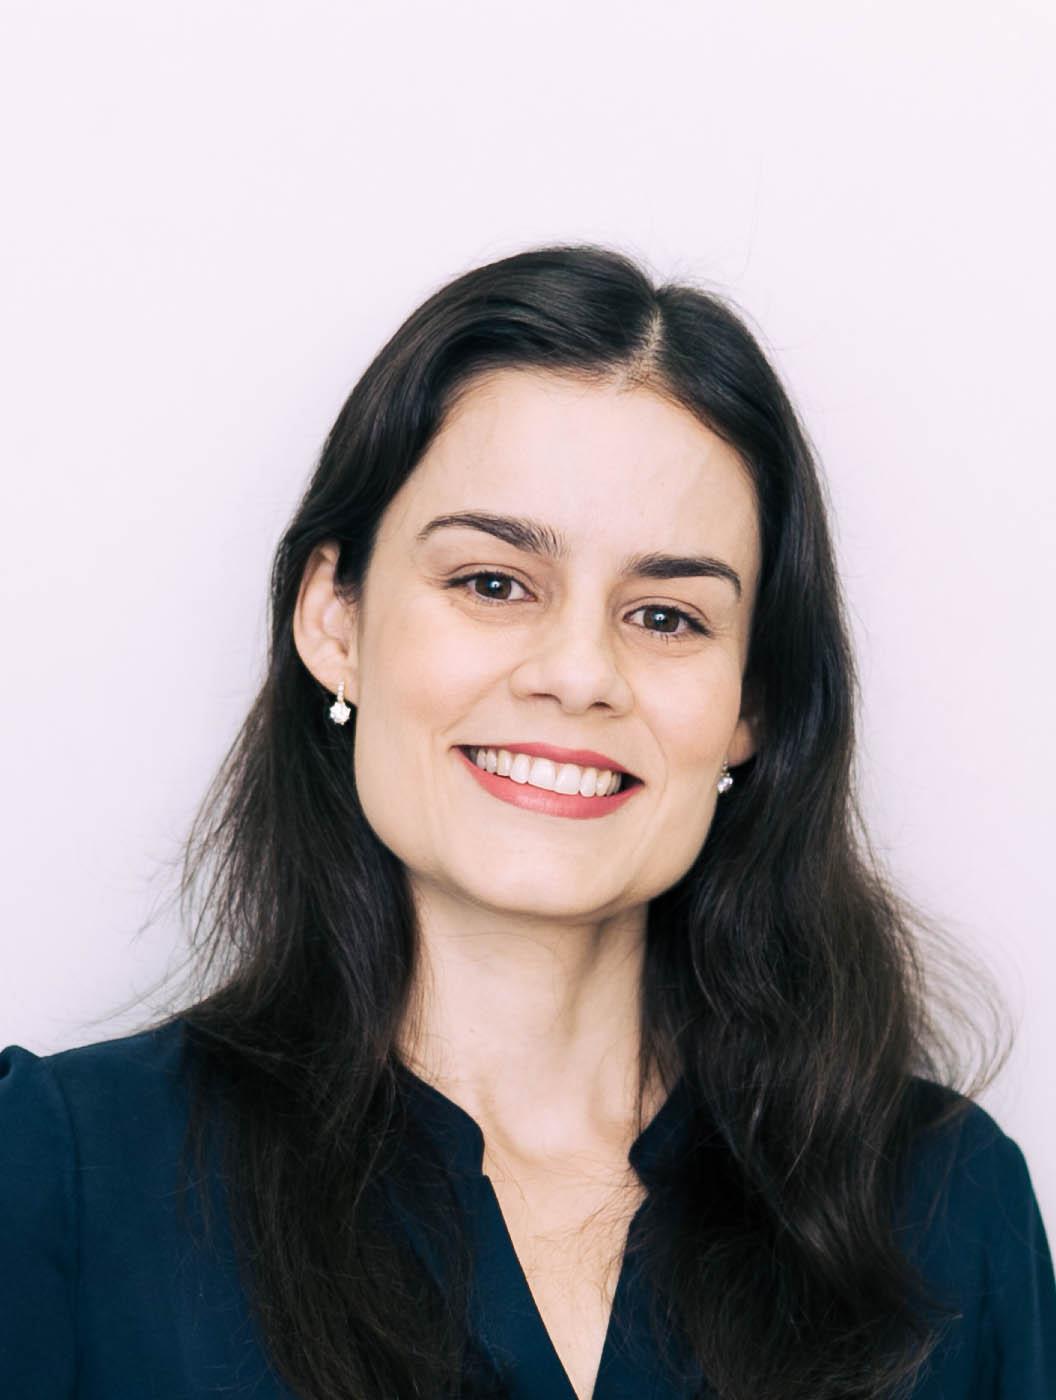 Letícia Figueredo